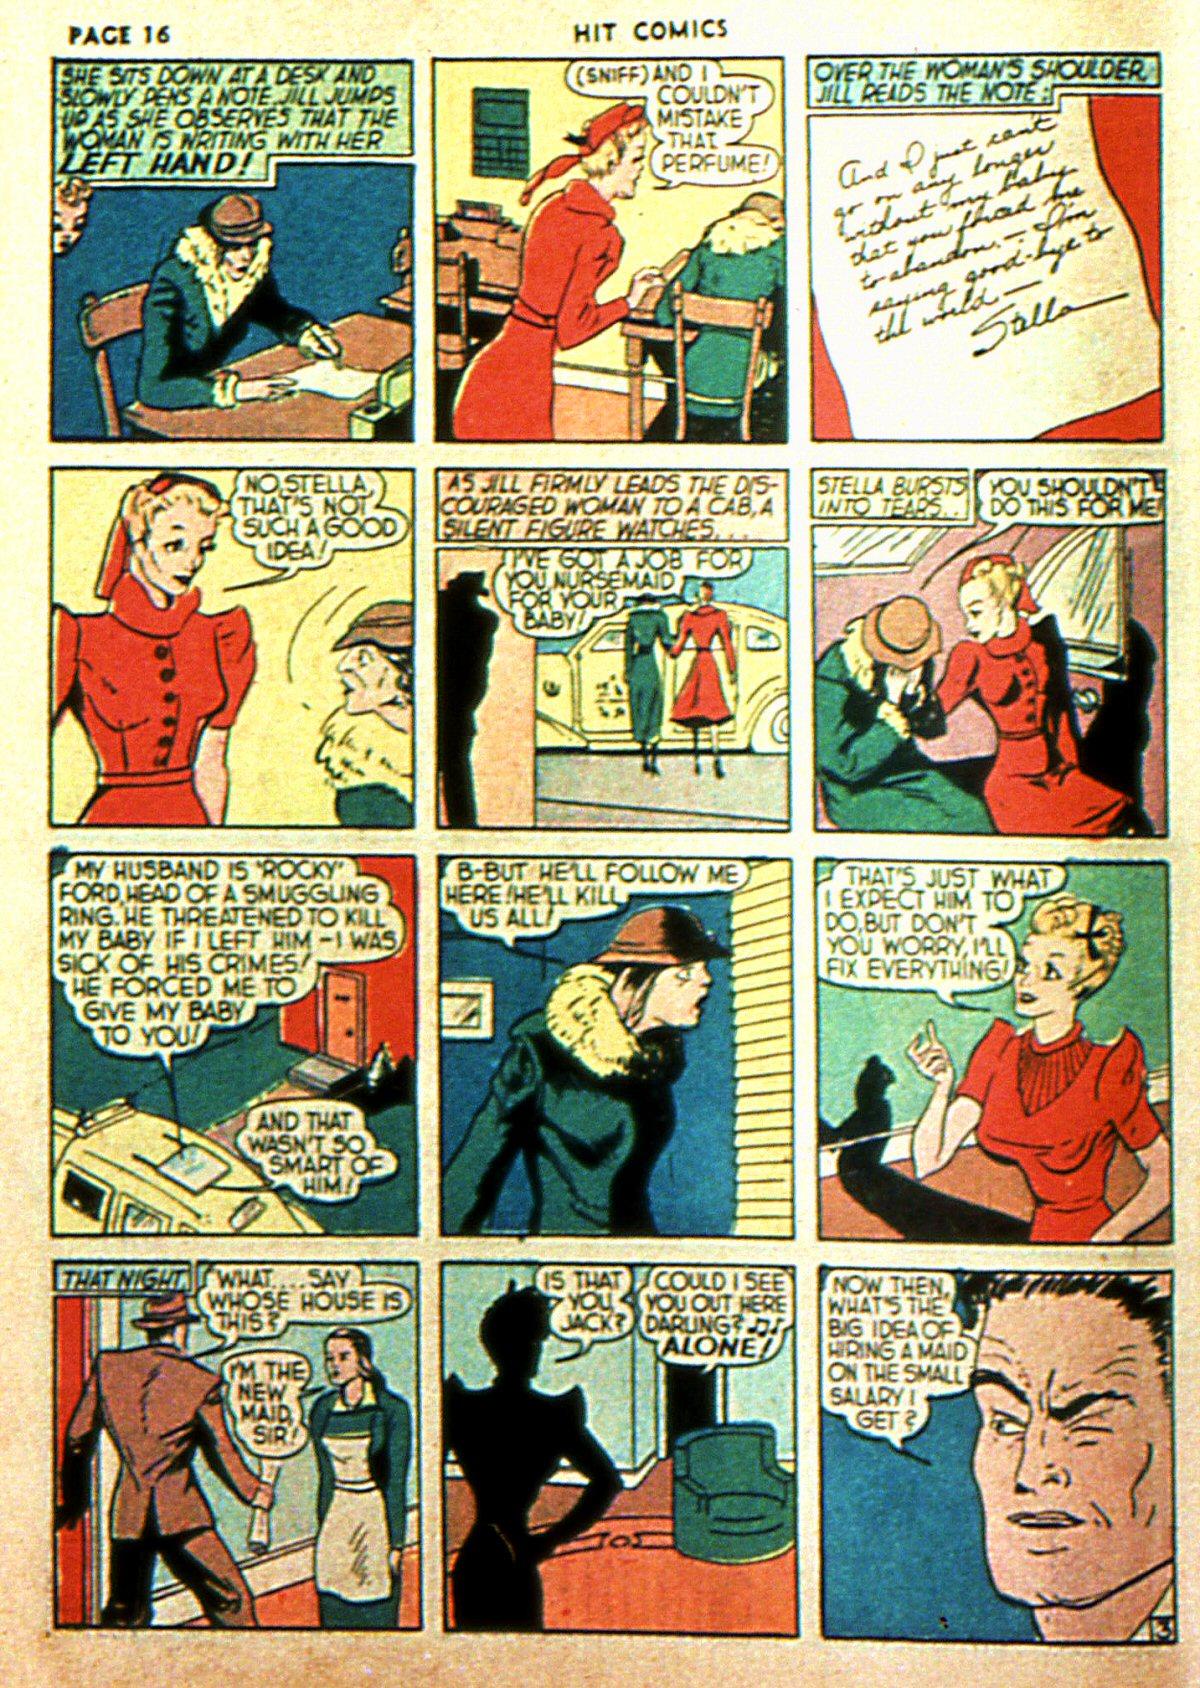 Read online Hit Comics comic -  Issue #2 - 18